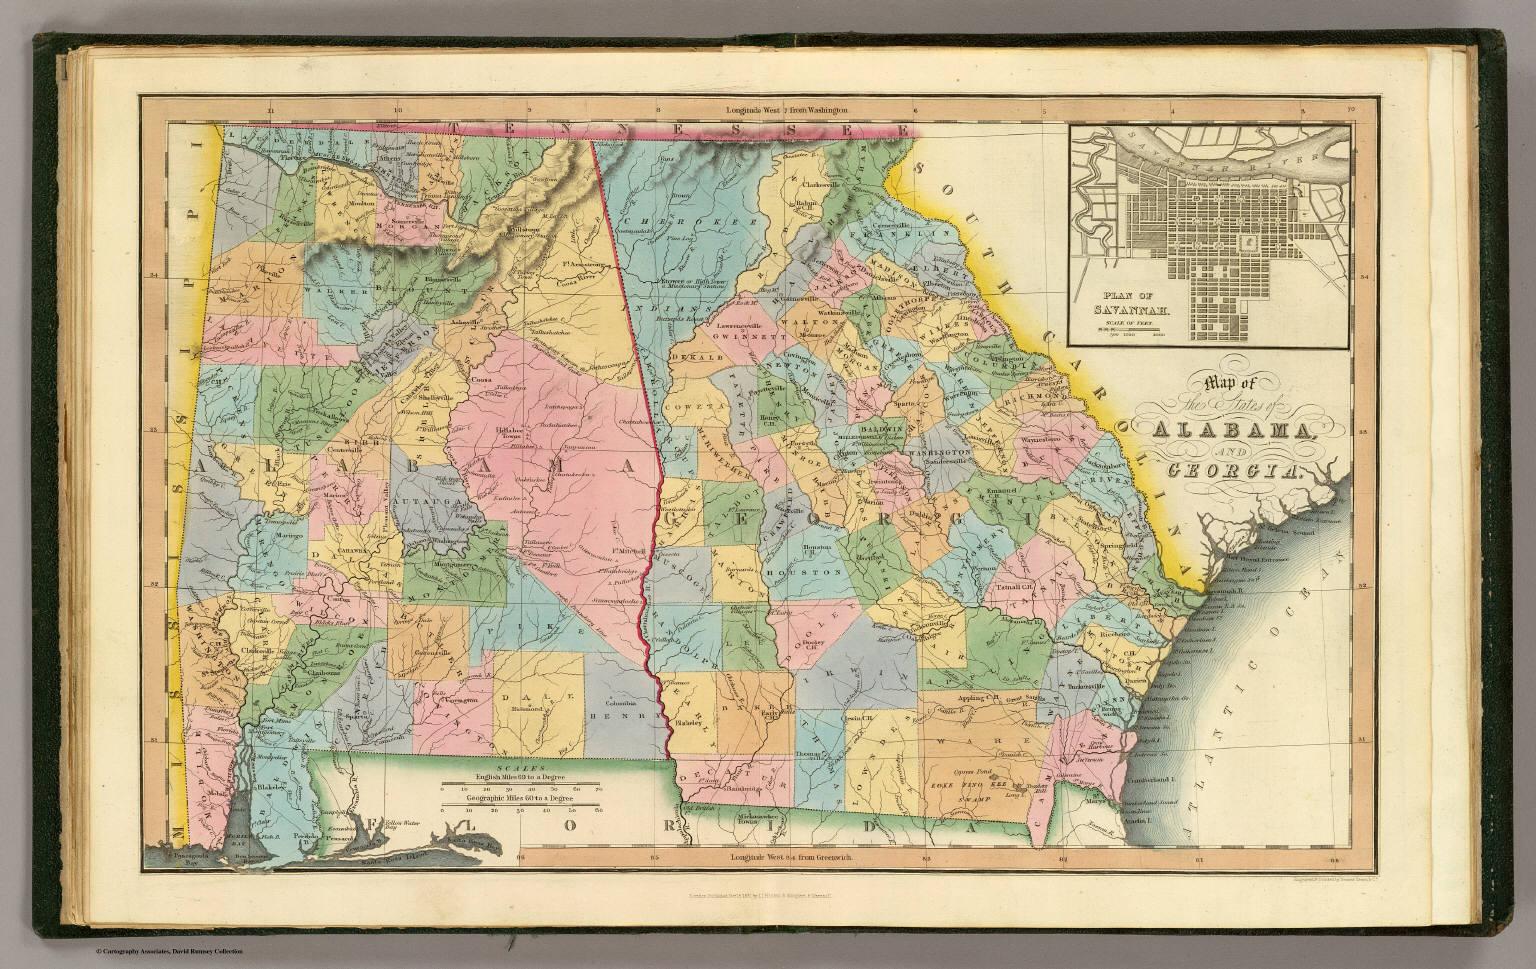 Alabama, Georgia. - David Rumsey Historical Map Collection